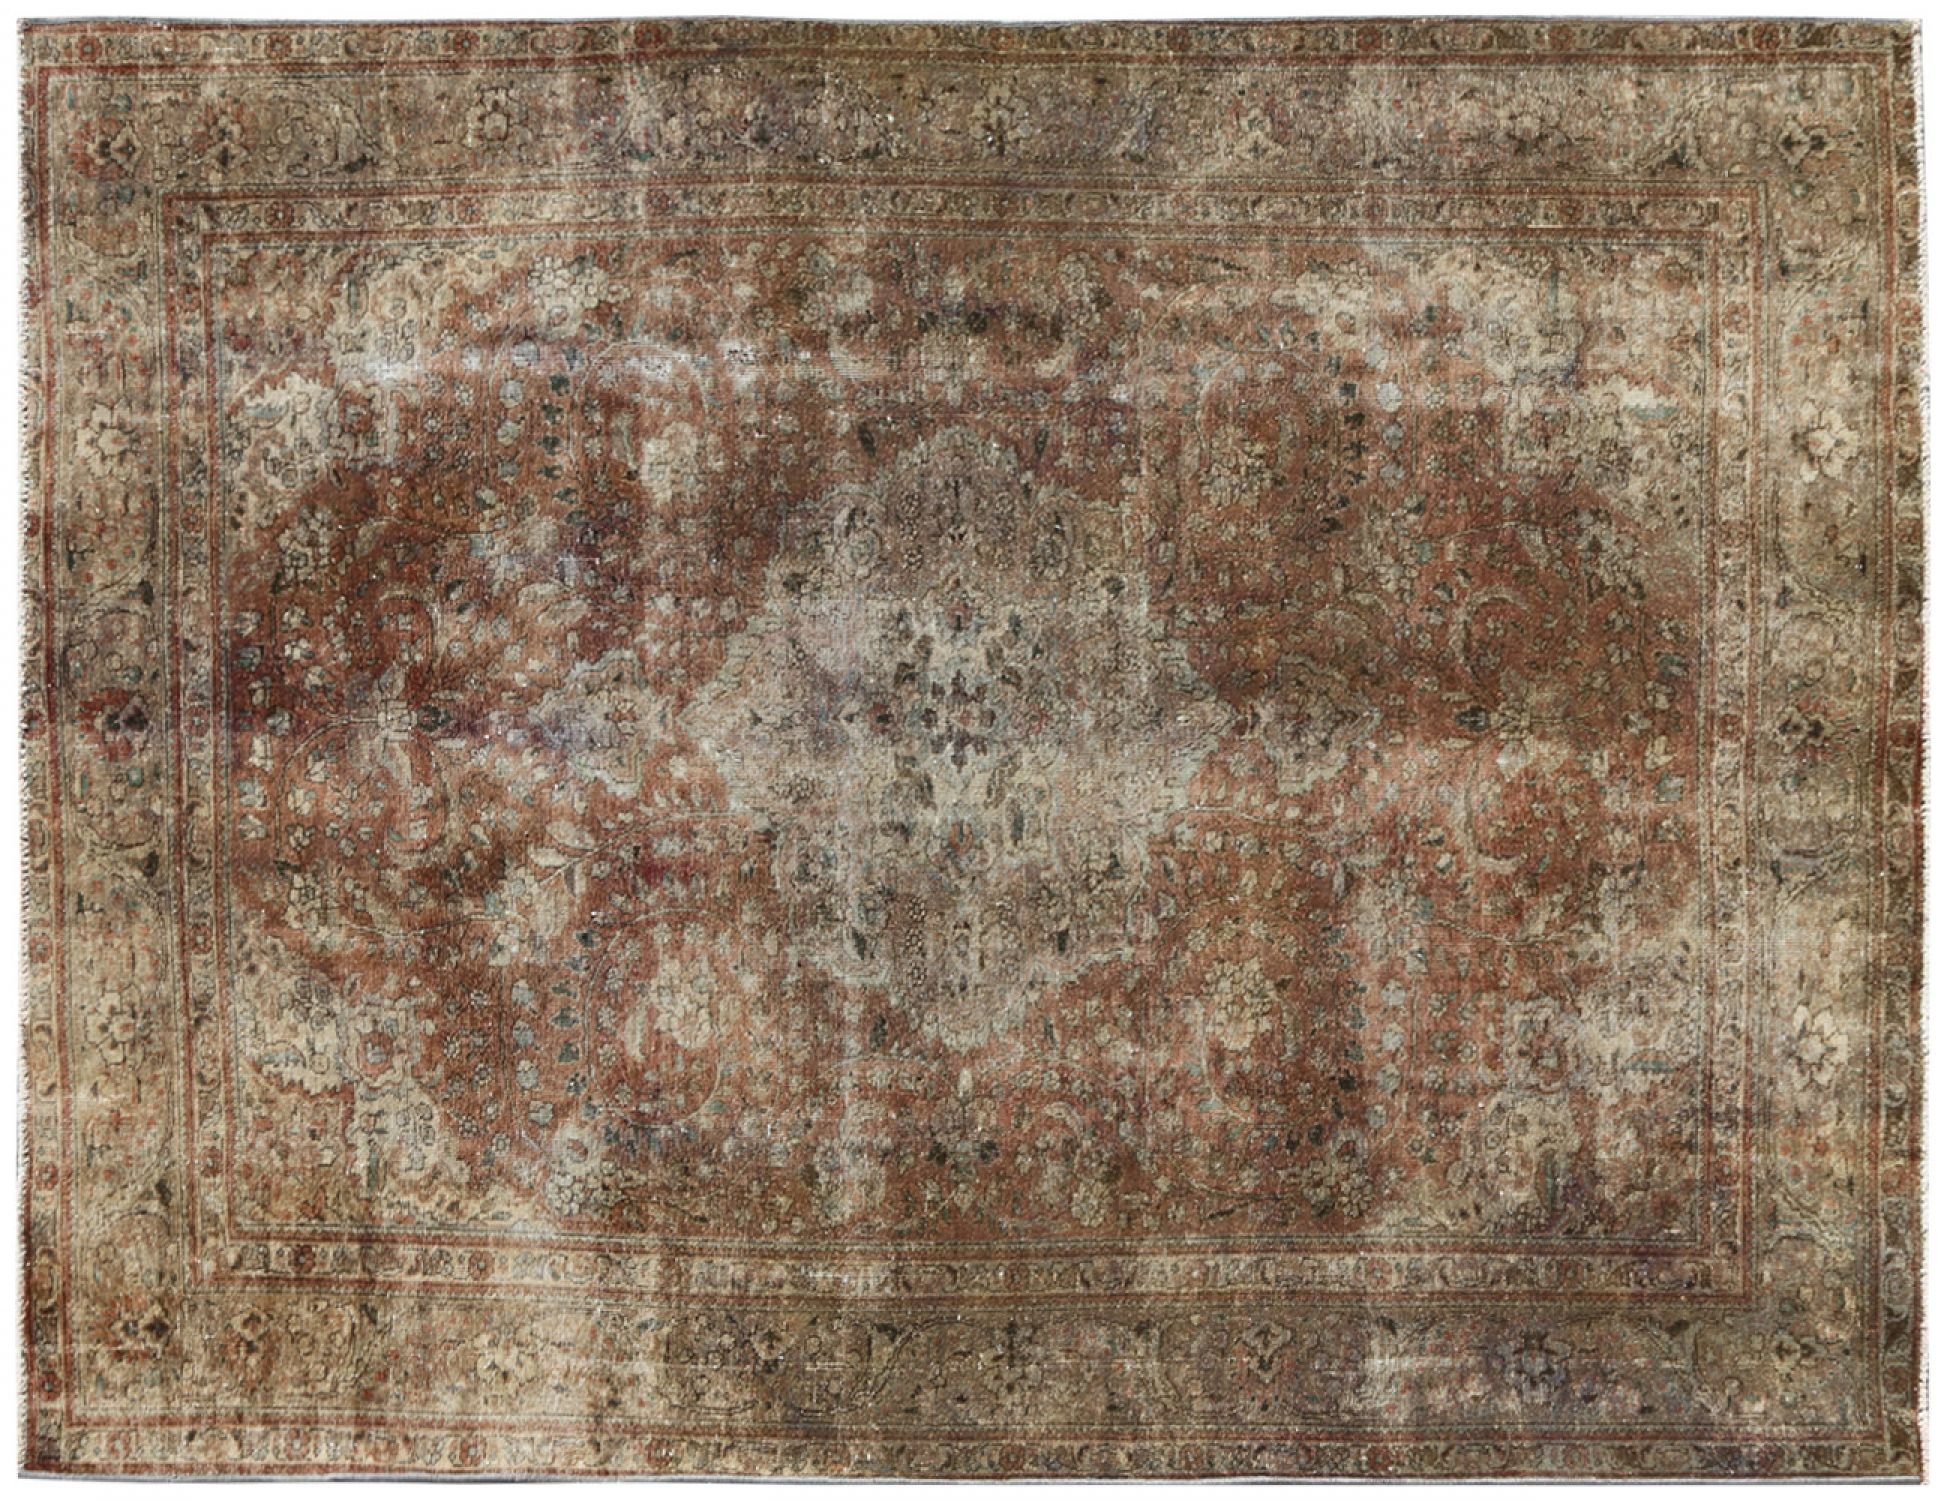 Vintage Carpet  grey <br/>285 x 211 cm